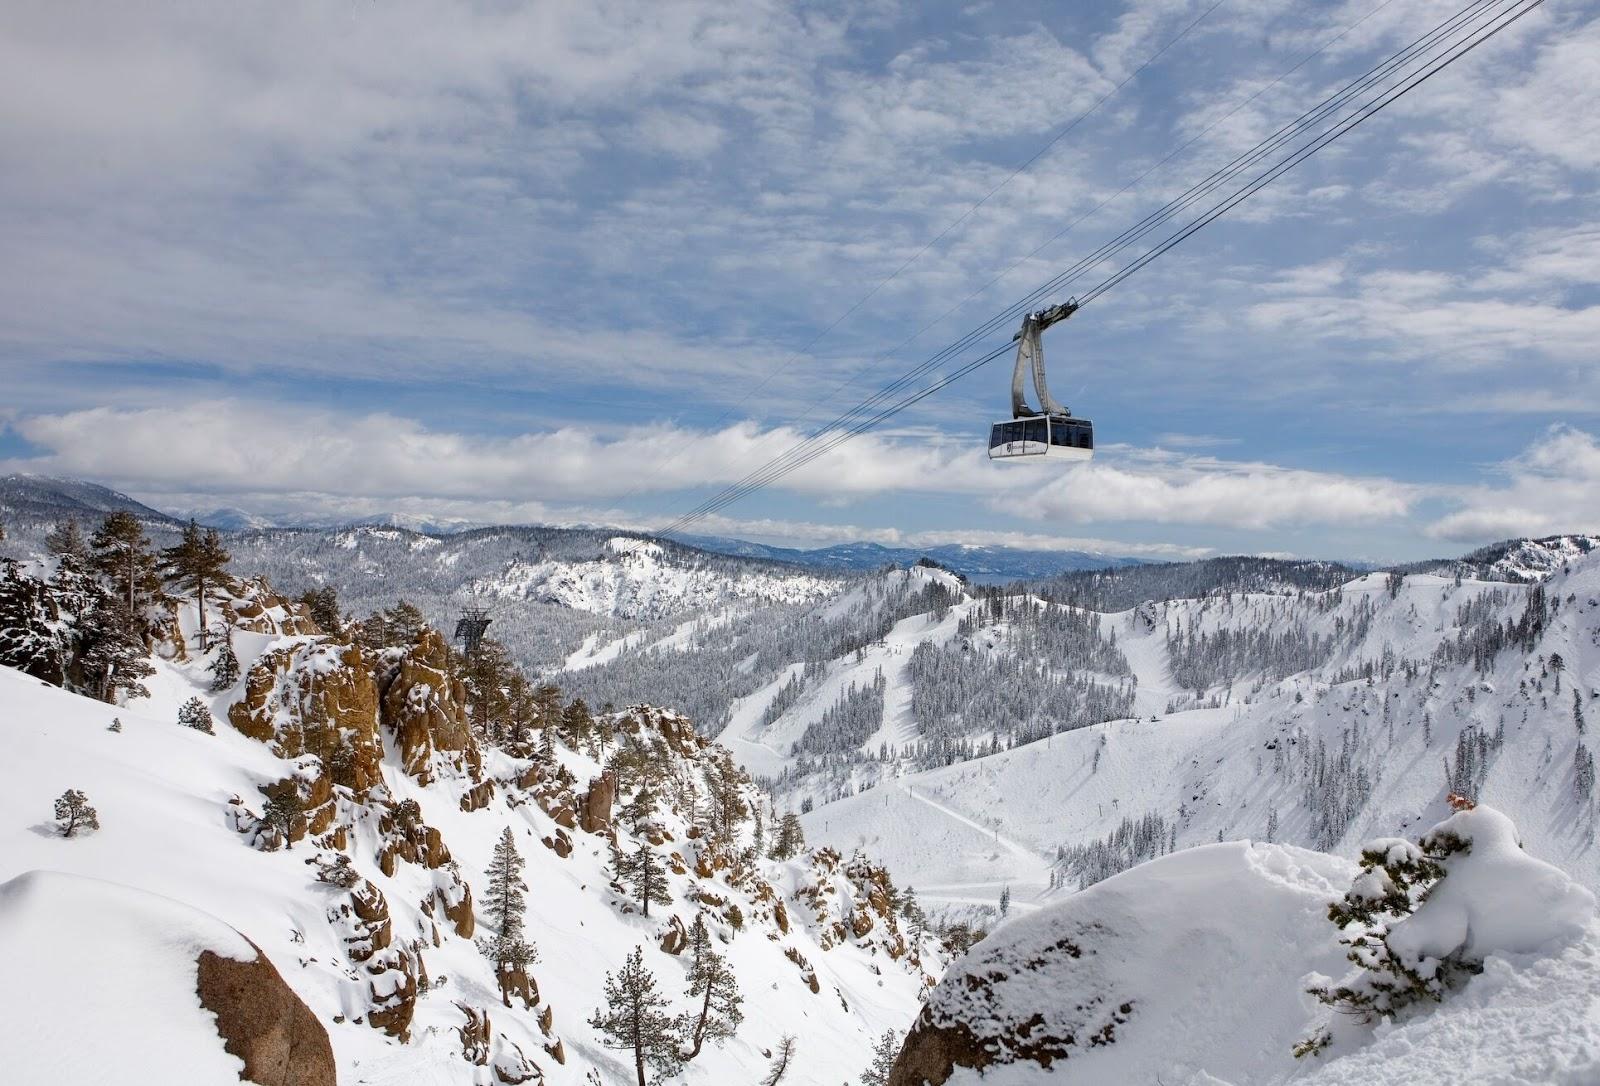 ski paradise: north america's biggest operators in the ski business